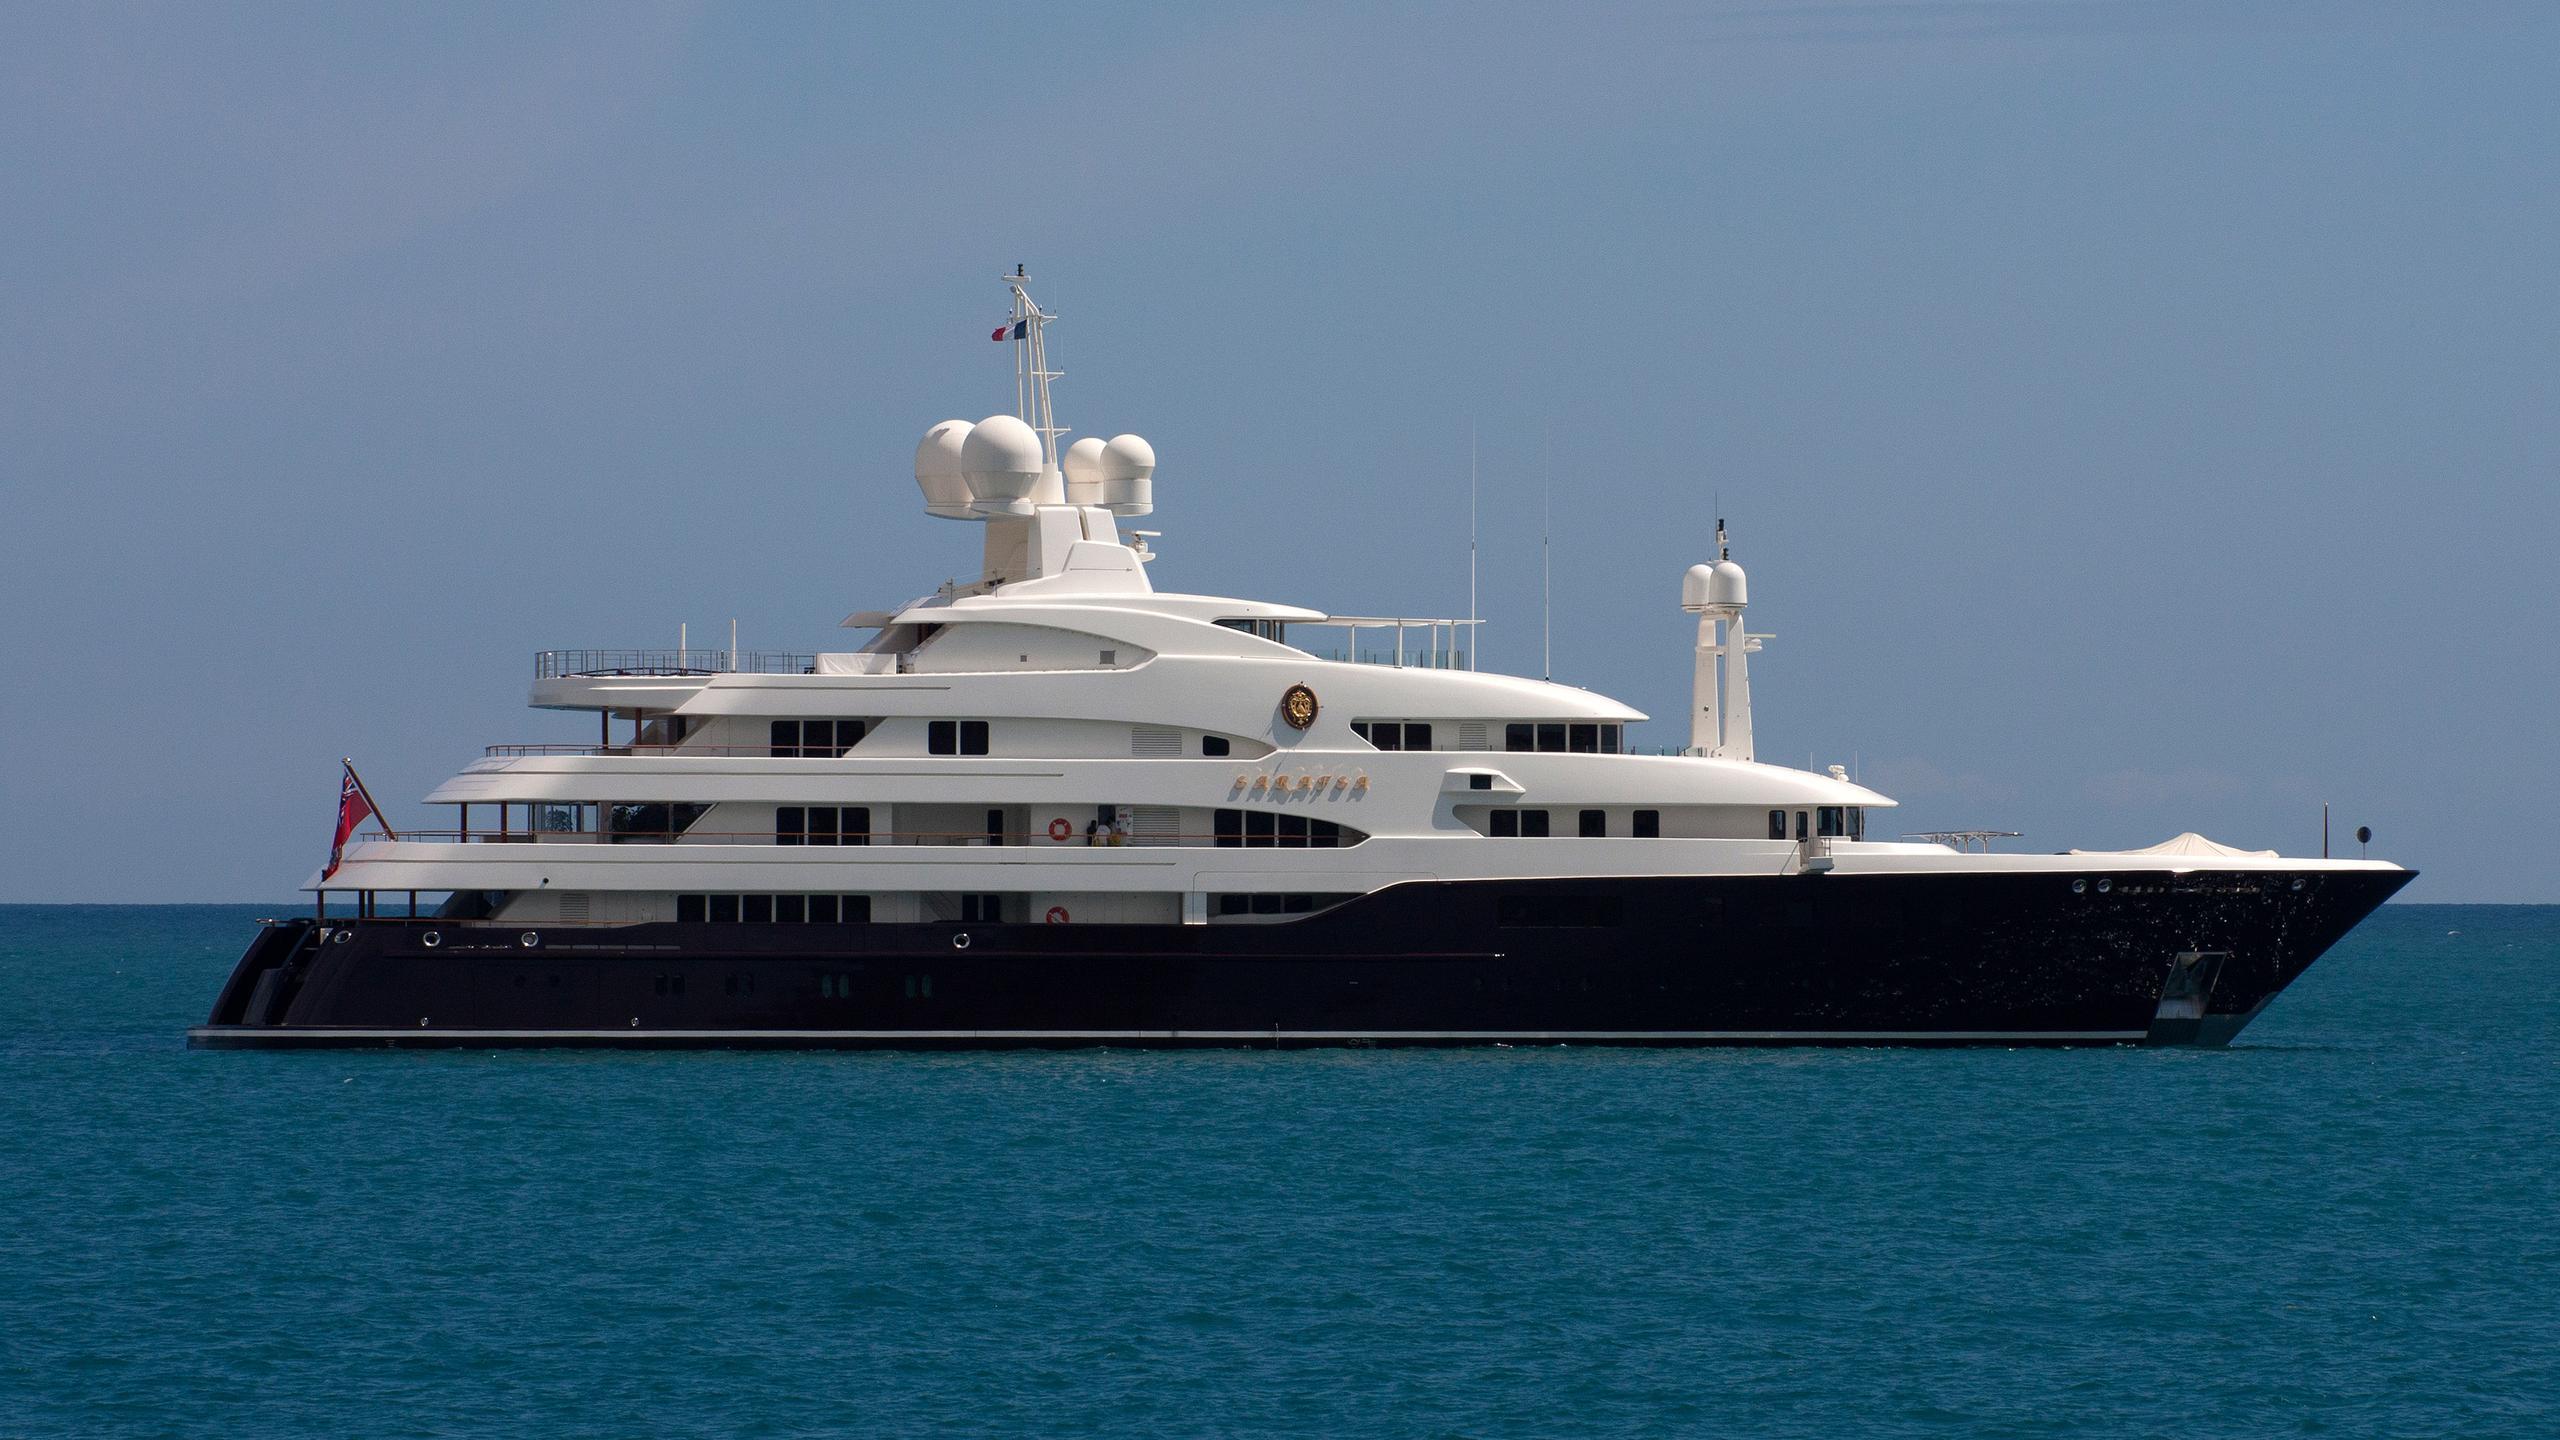 sarafsa-motor-yacht-devonport-2008-82m-profile